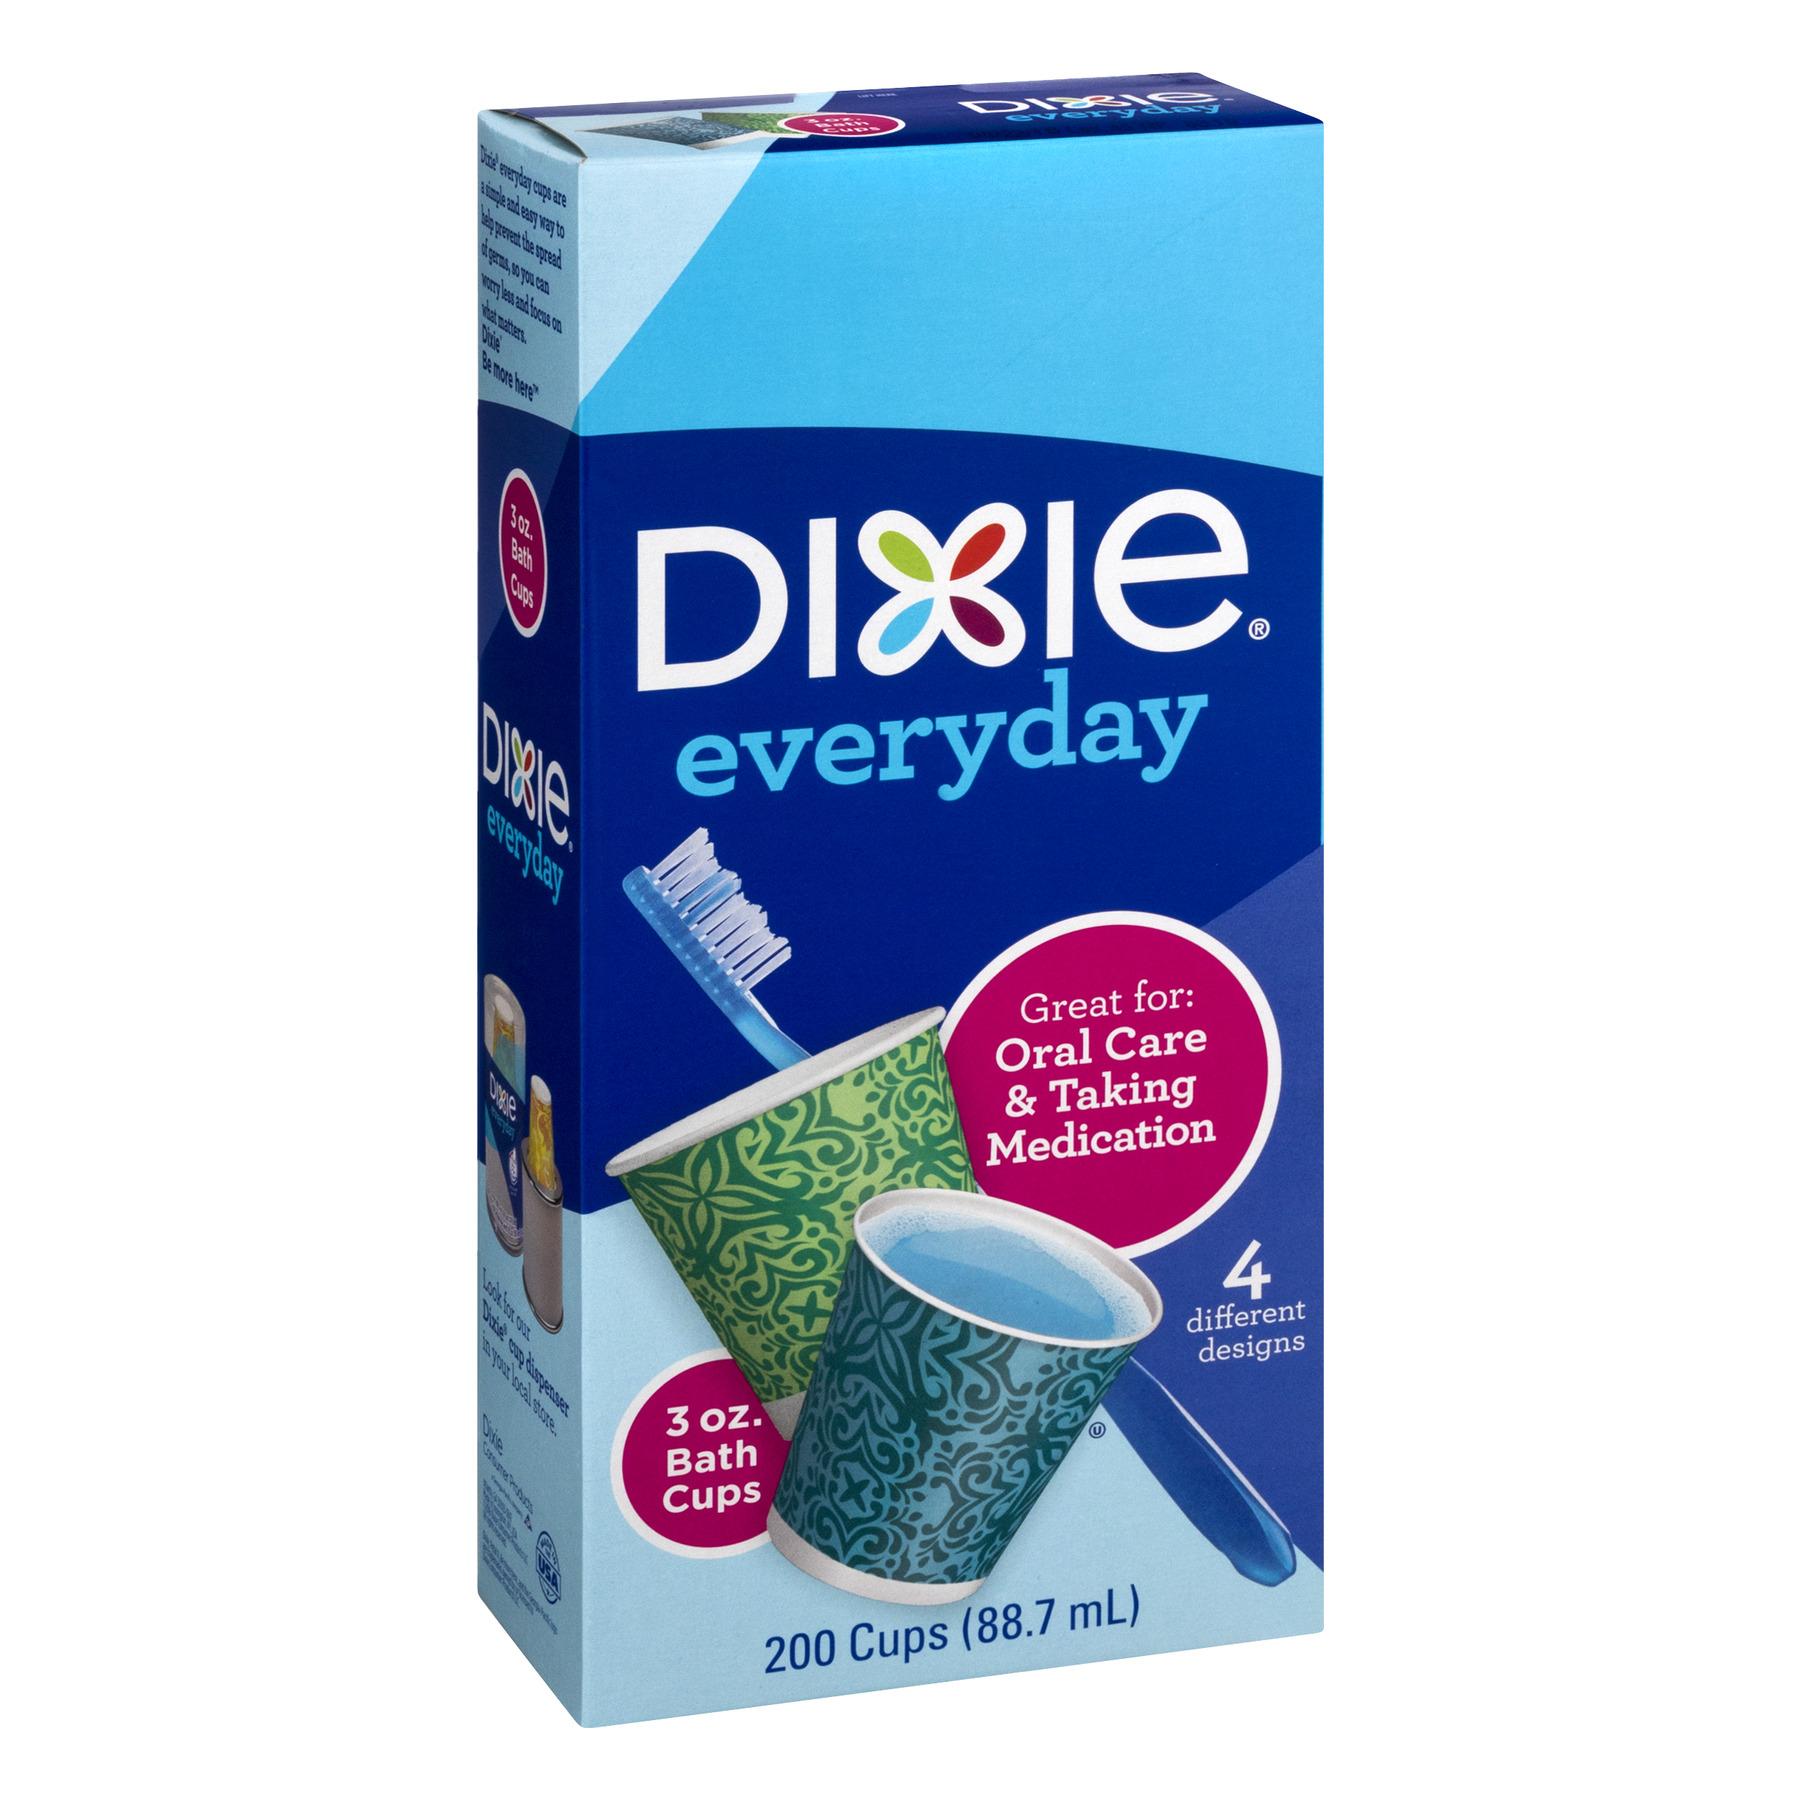 dixie everyday bath cups 3 oz 200 ct walmart